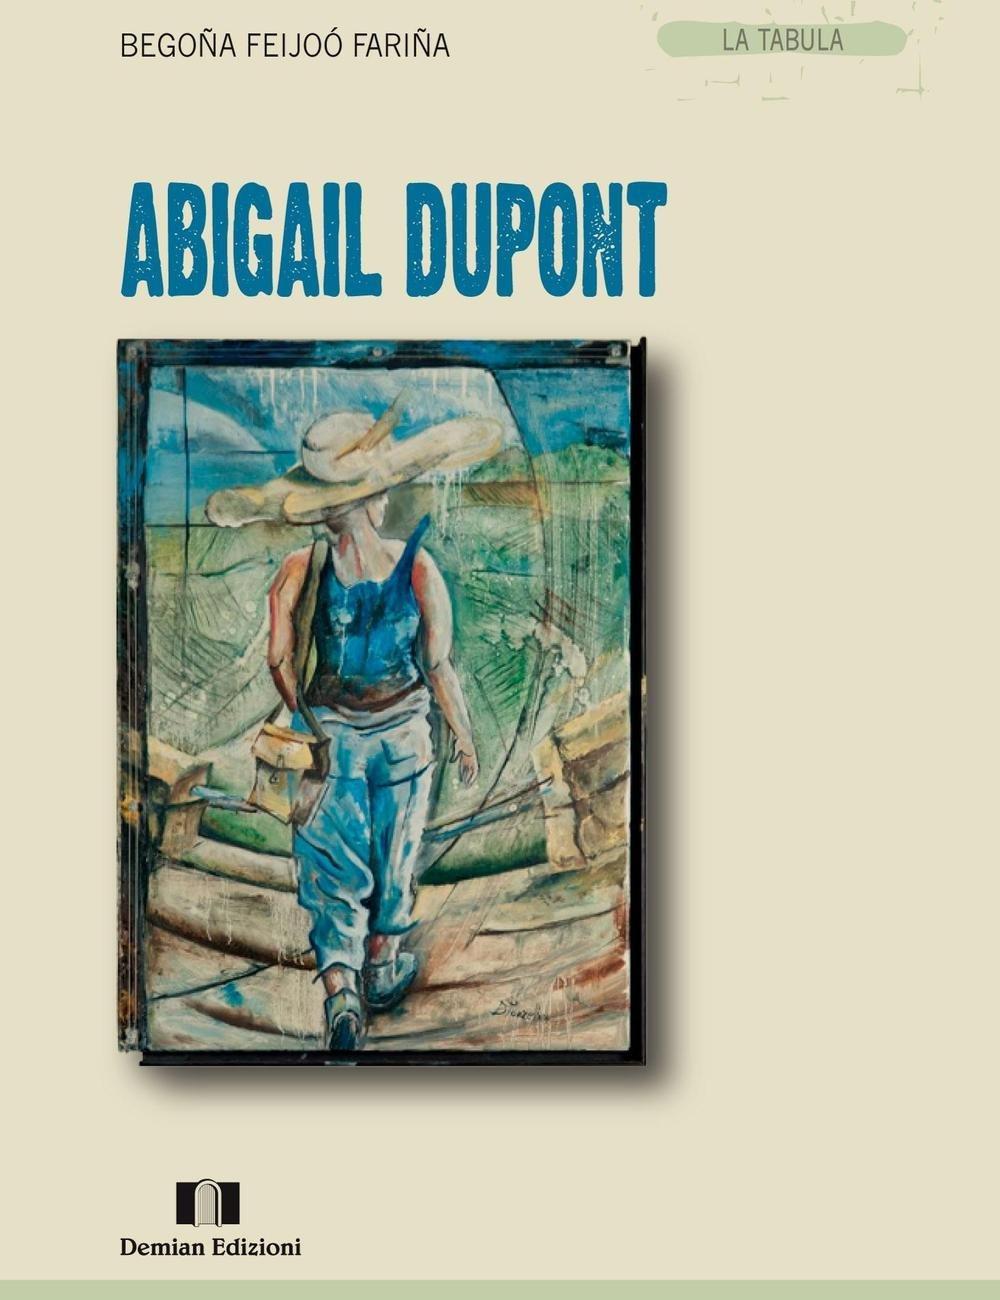 copertina_Abigail_Dupont.jpg